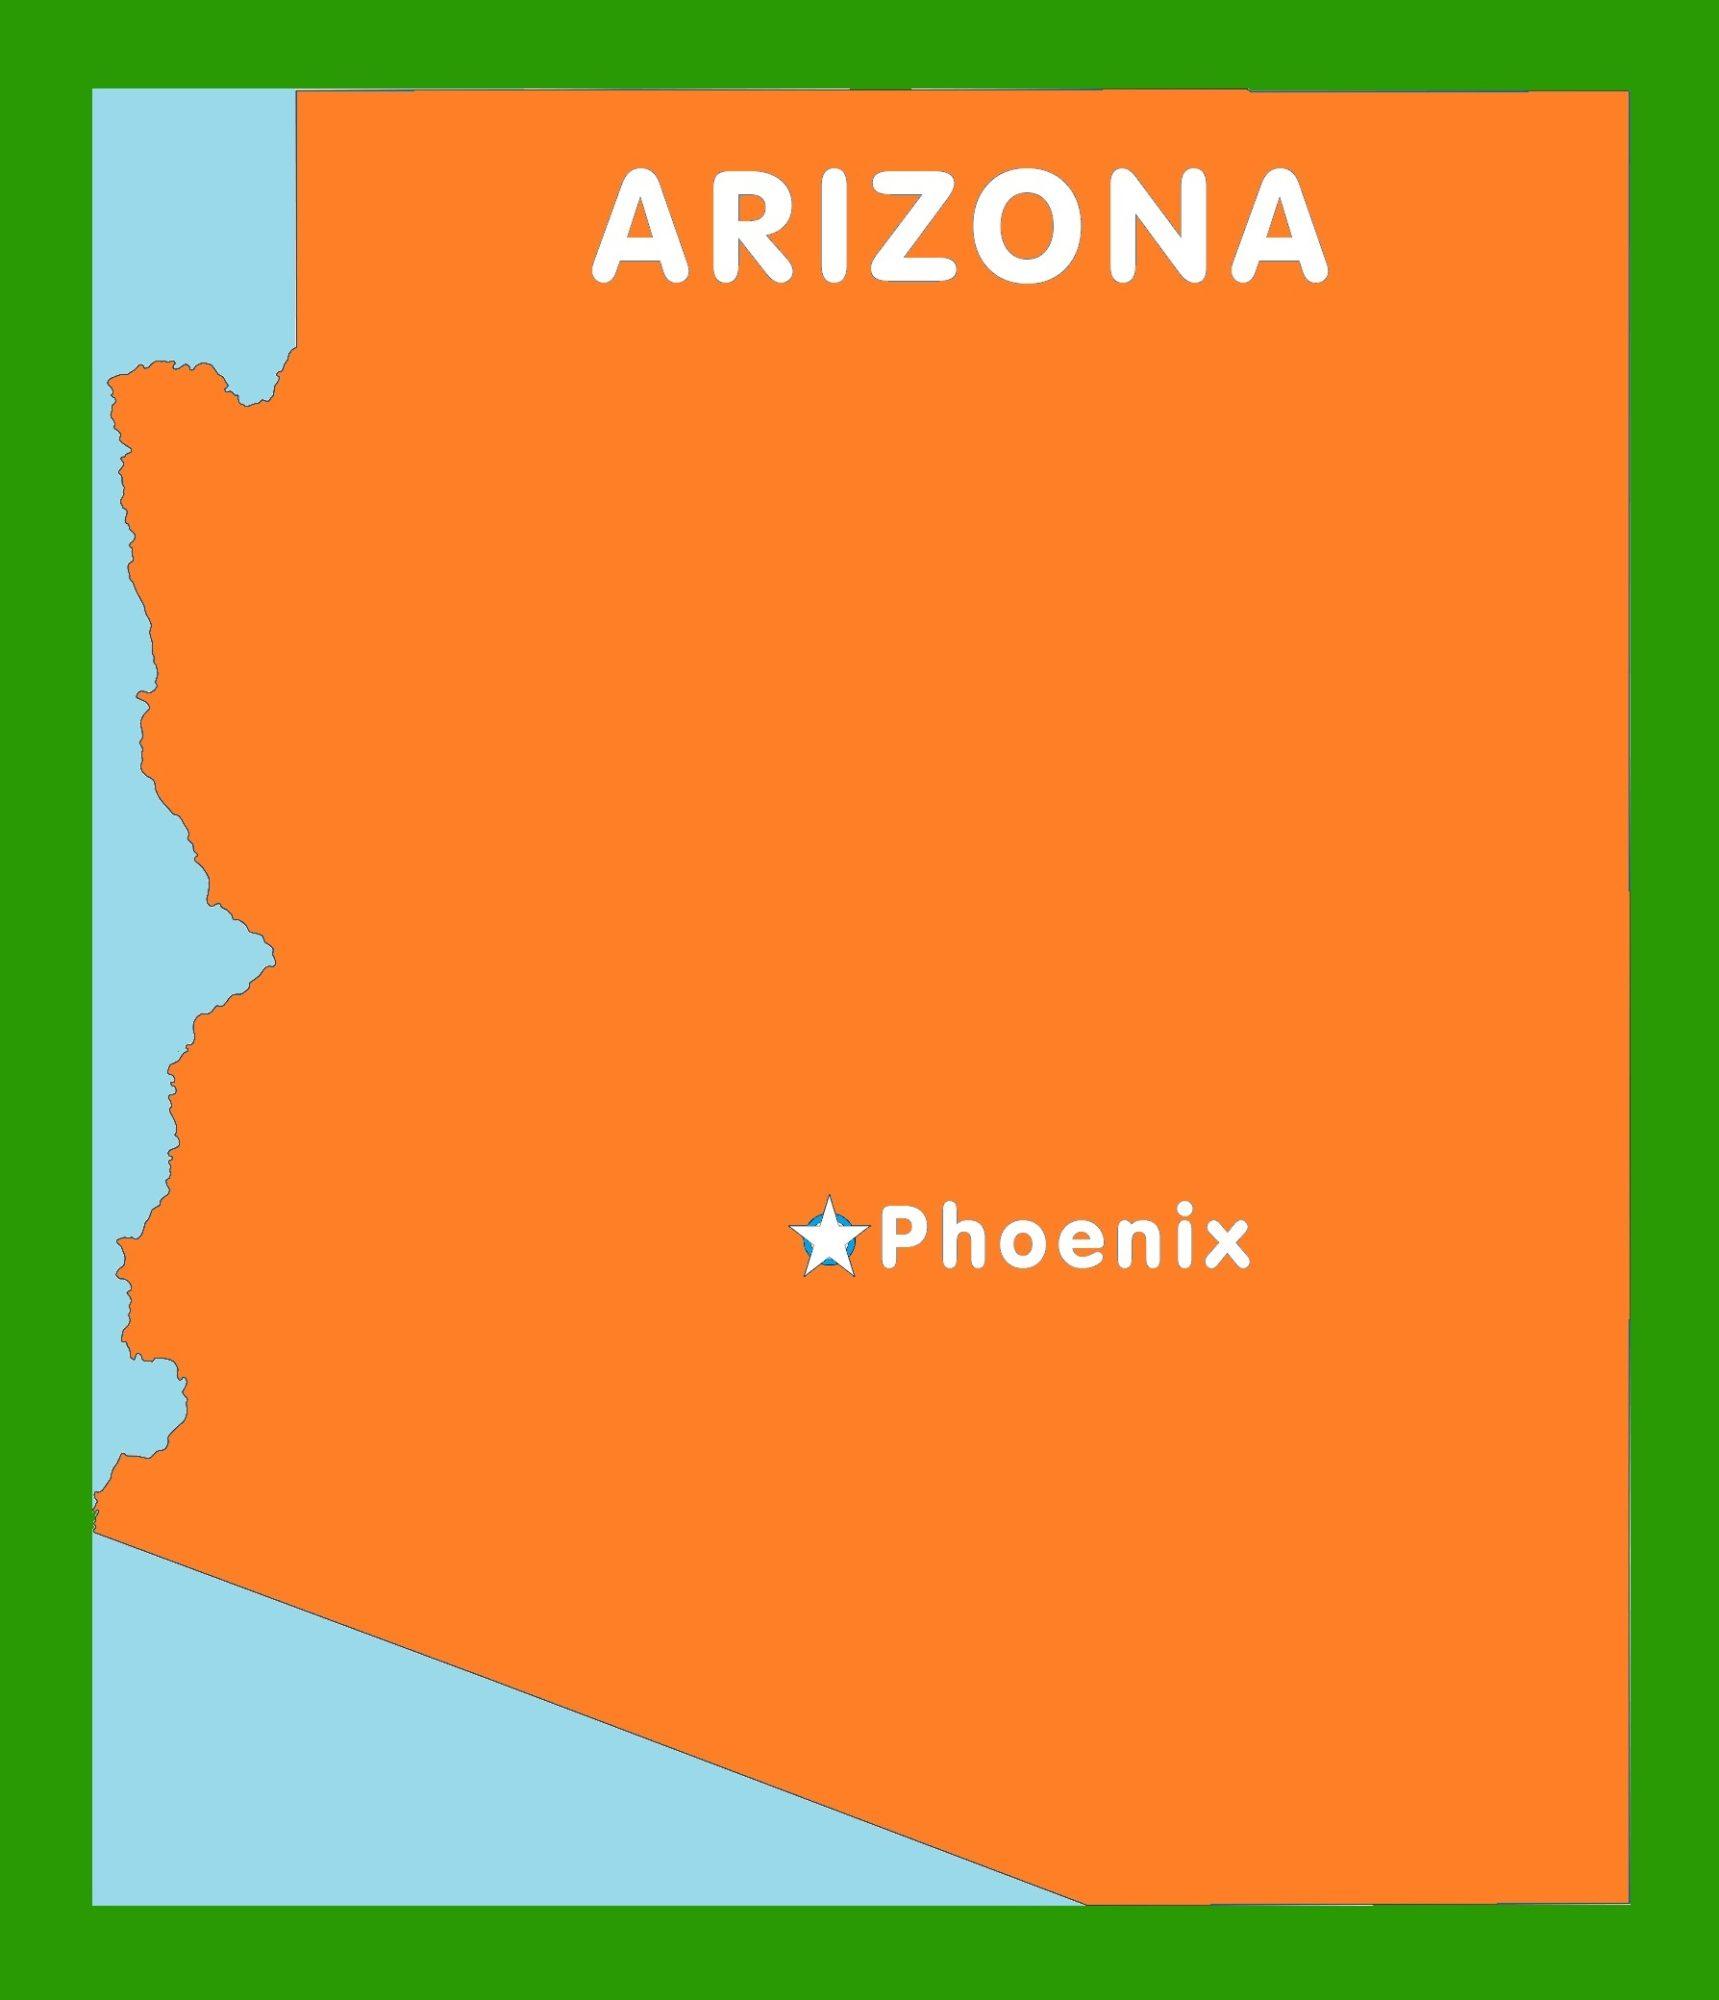 Arizona Capital Map | Large Printable and Standard Map